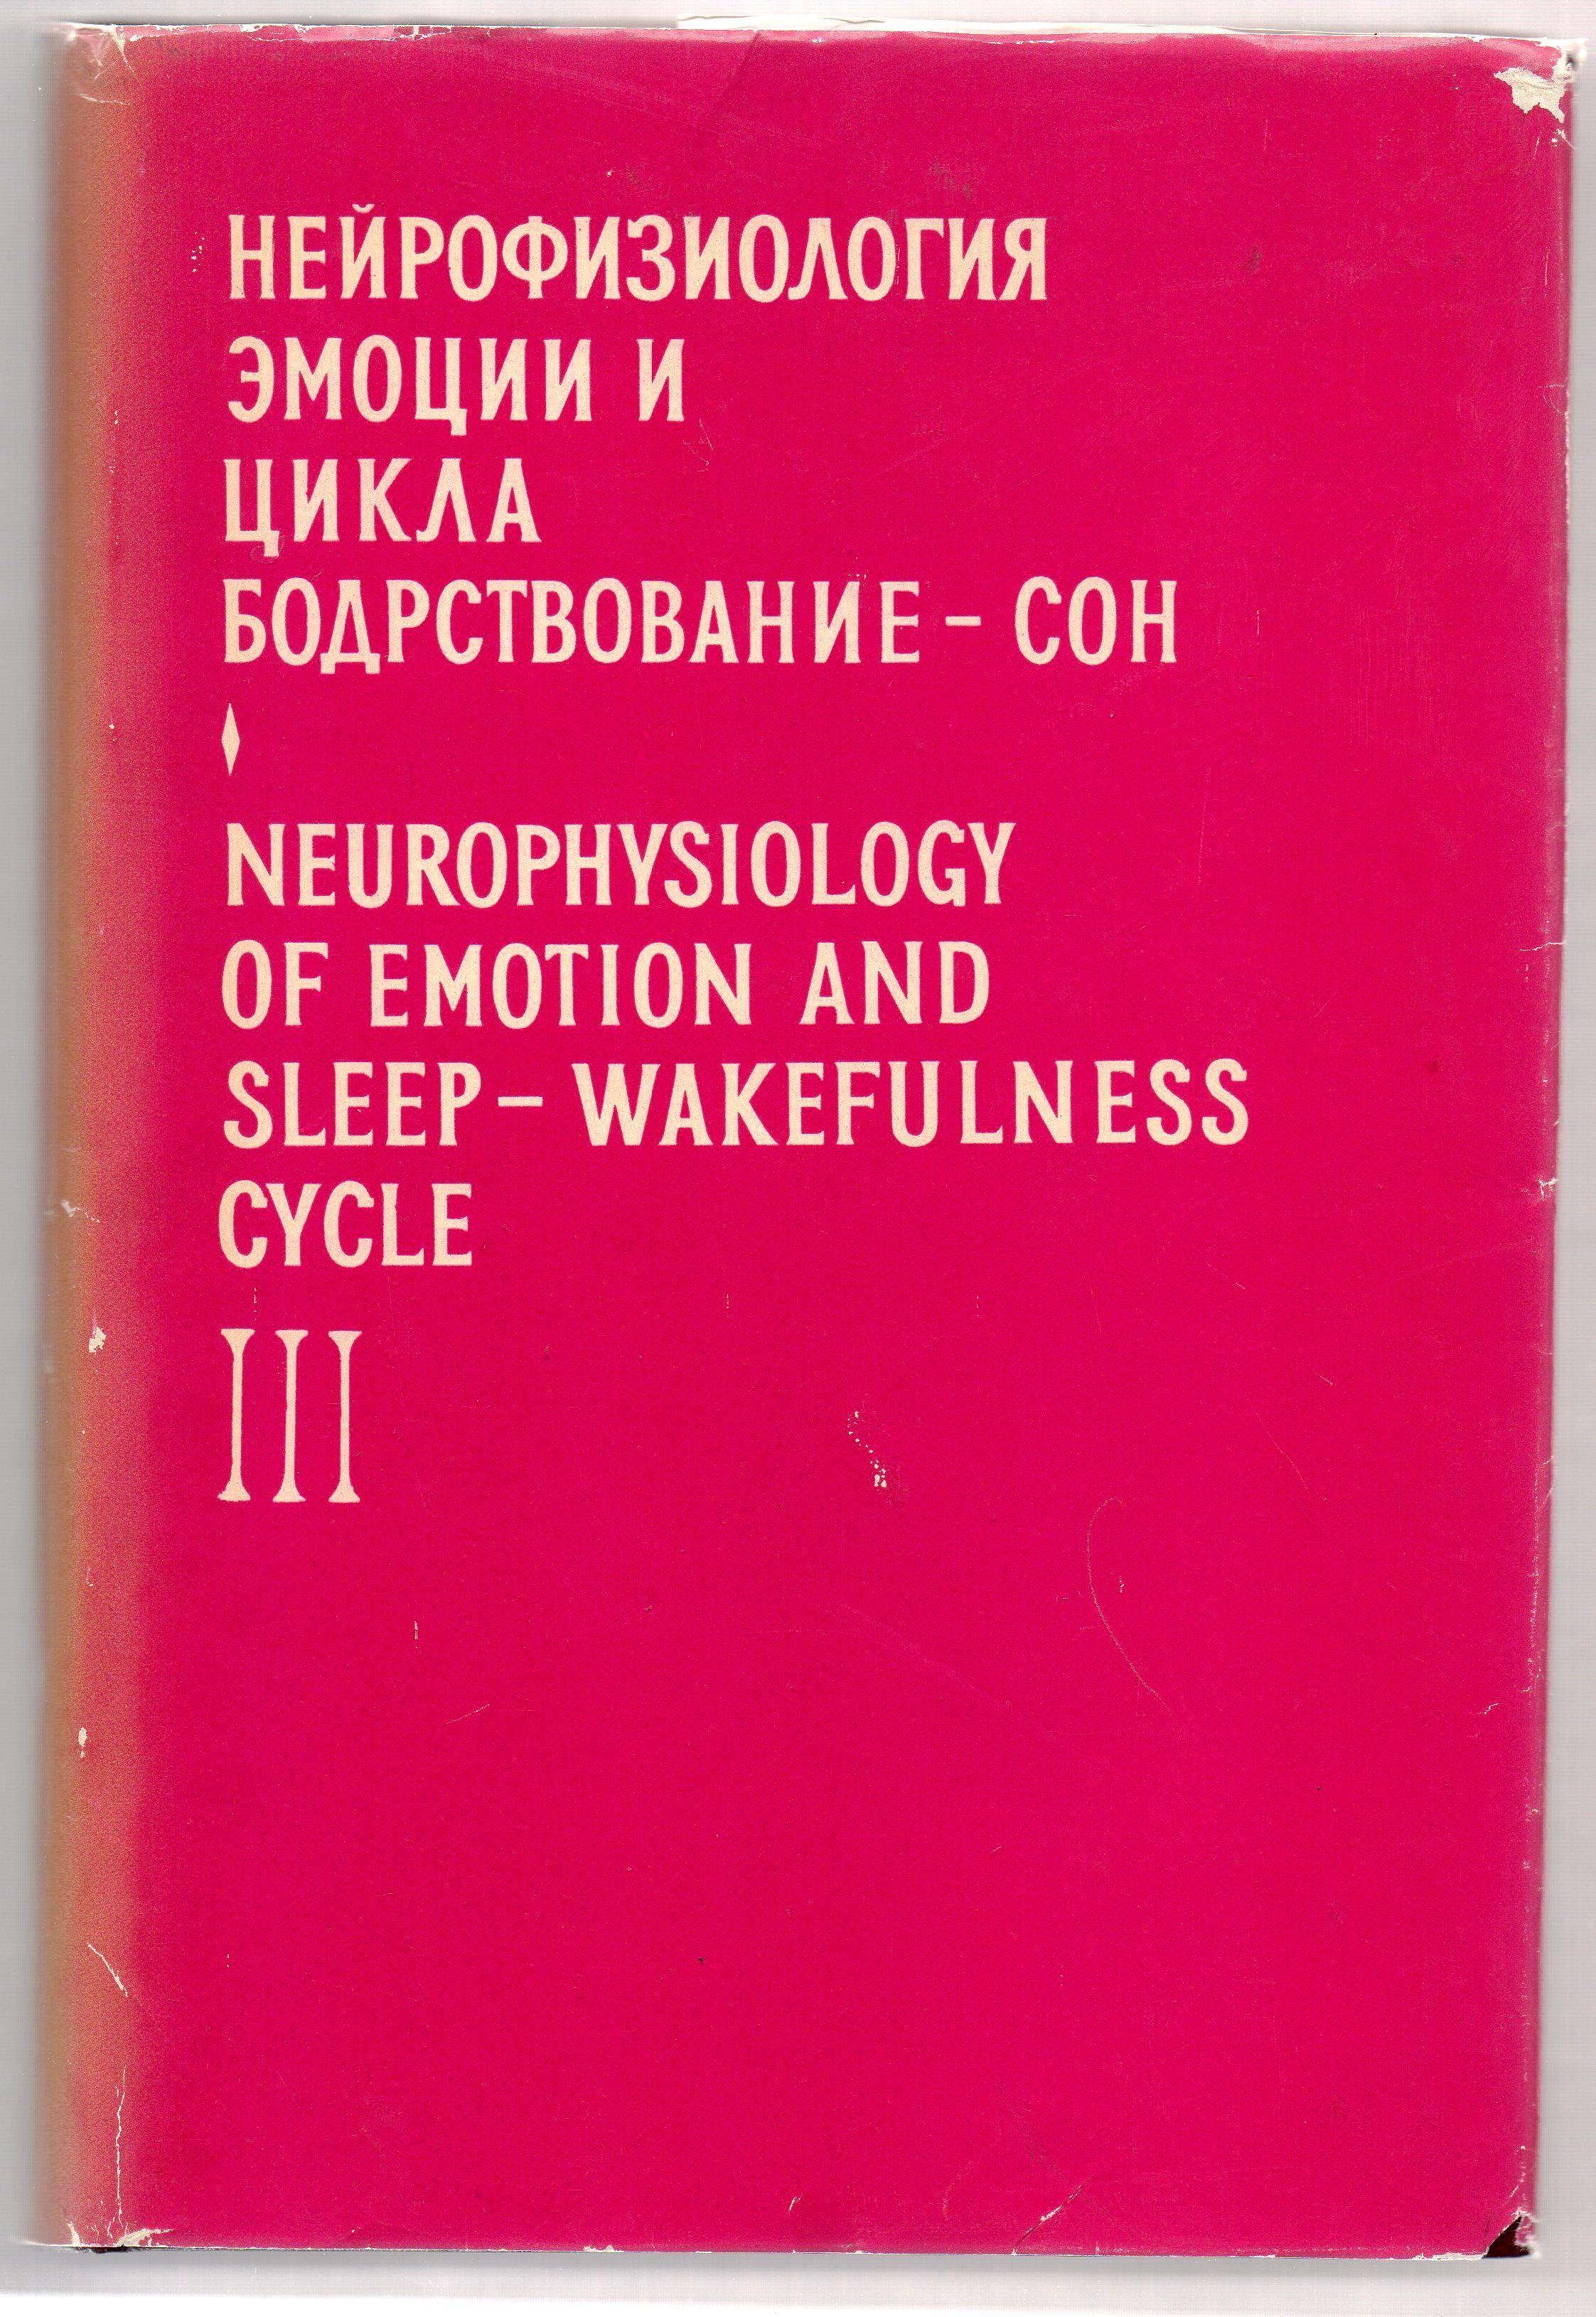 Neurophysiology Of Emotion And Sleep Wakefulness Cycle Iii